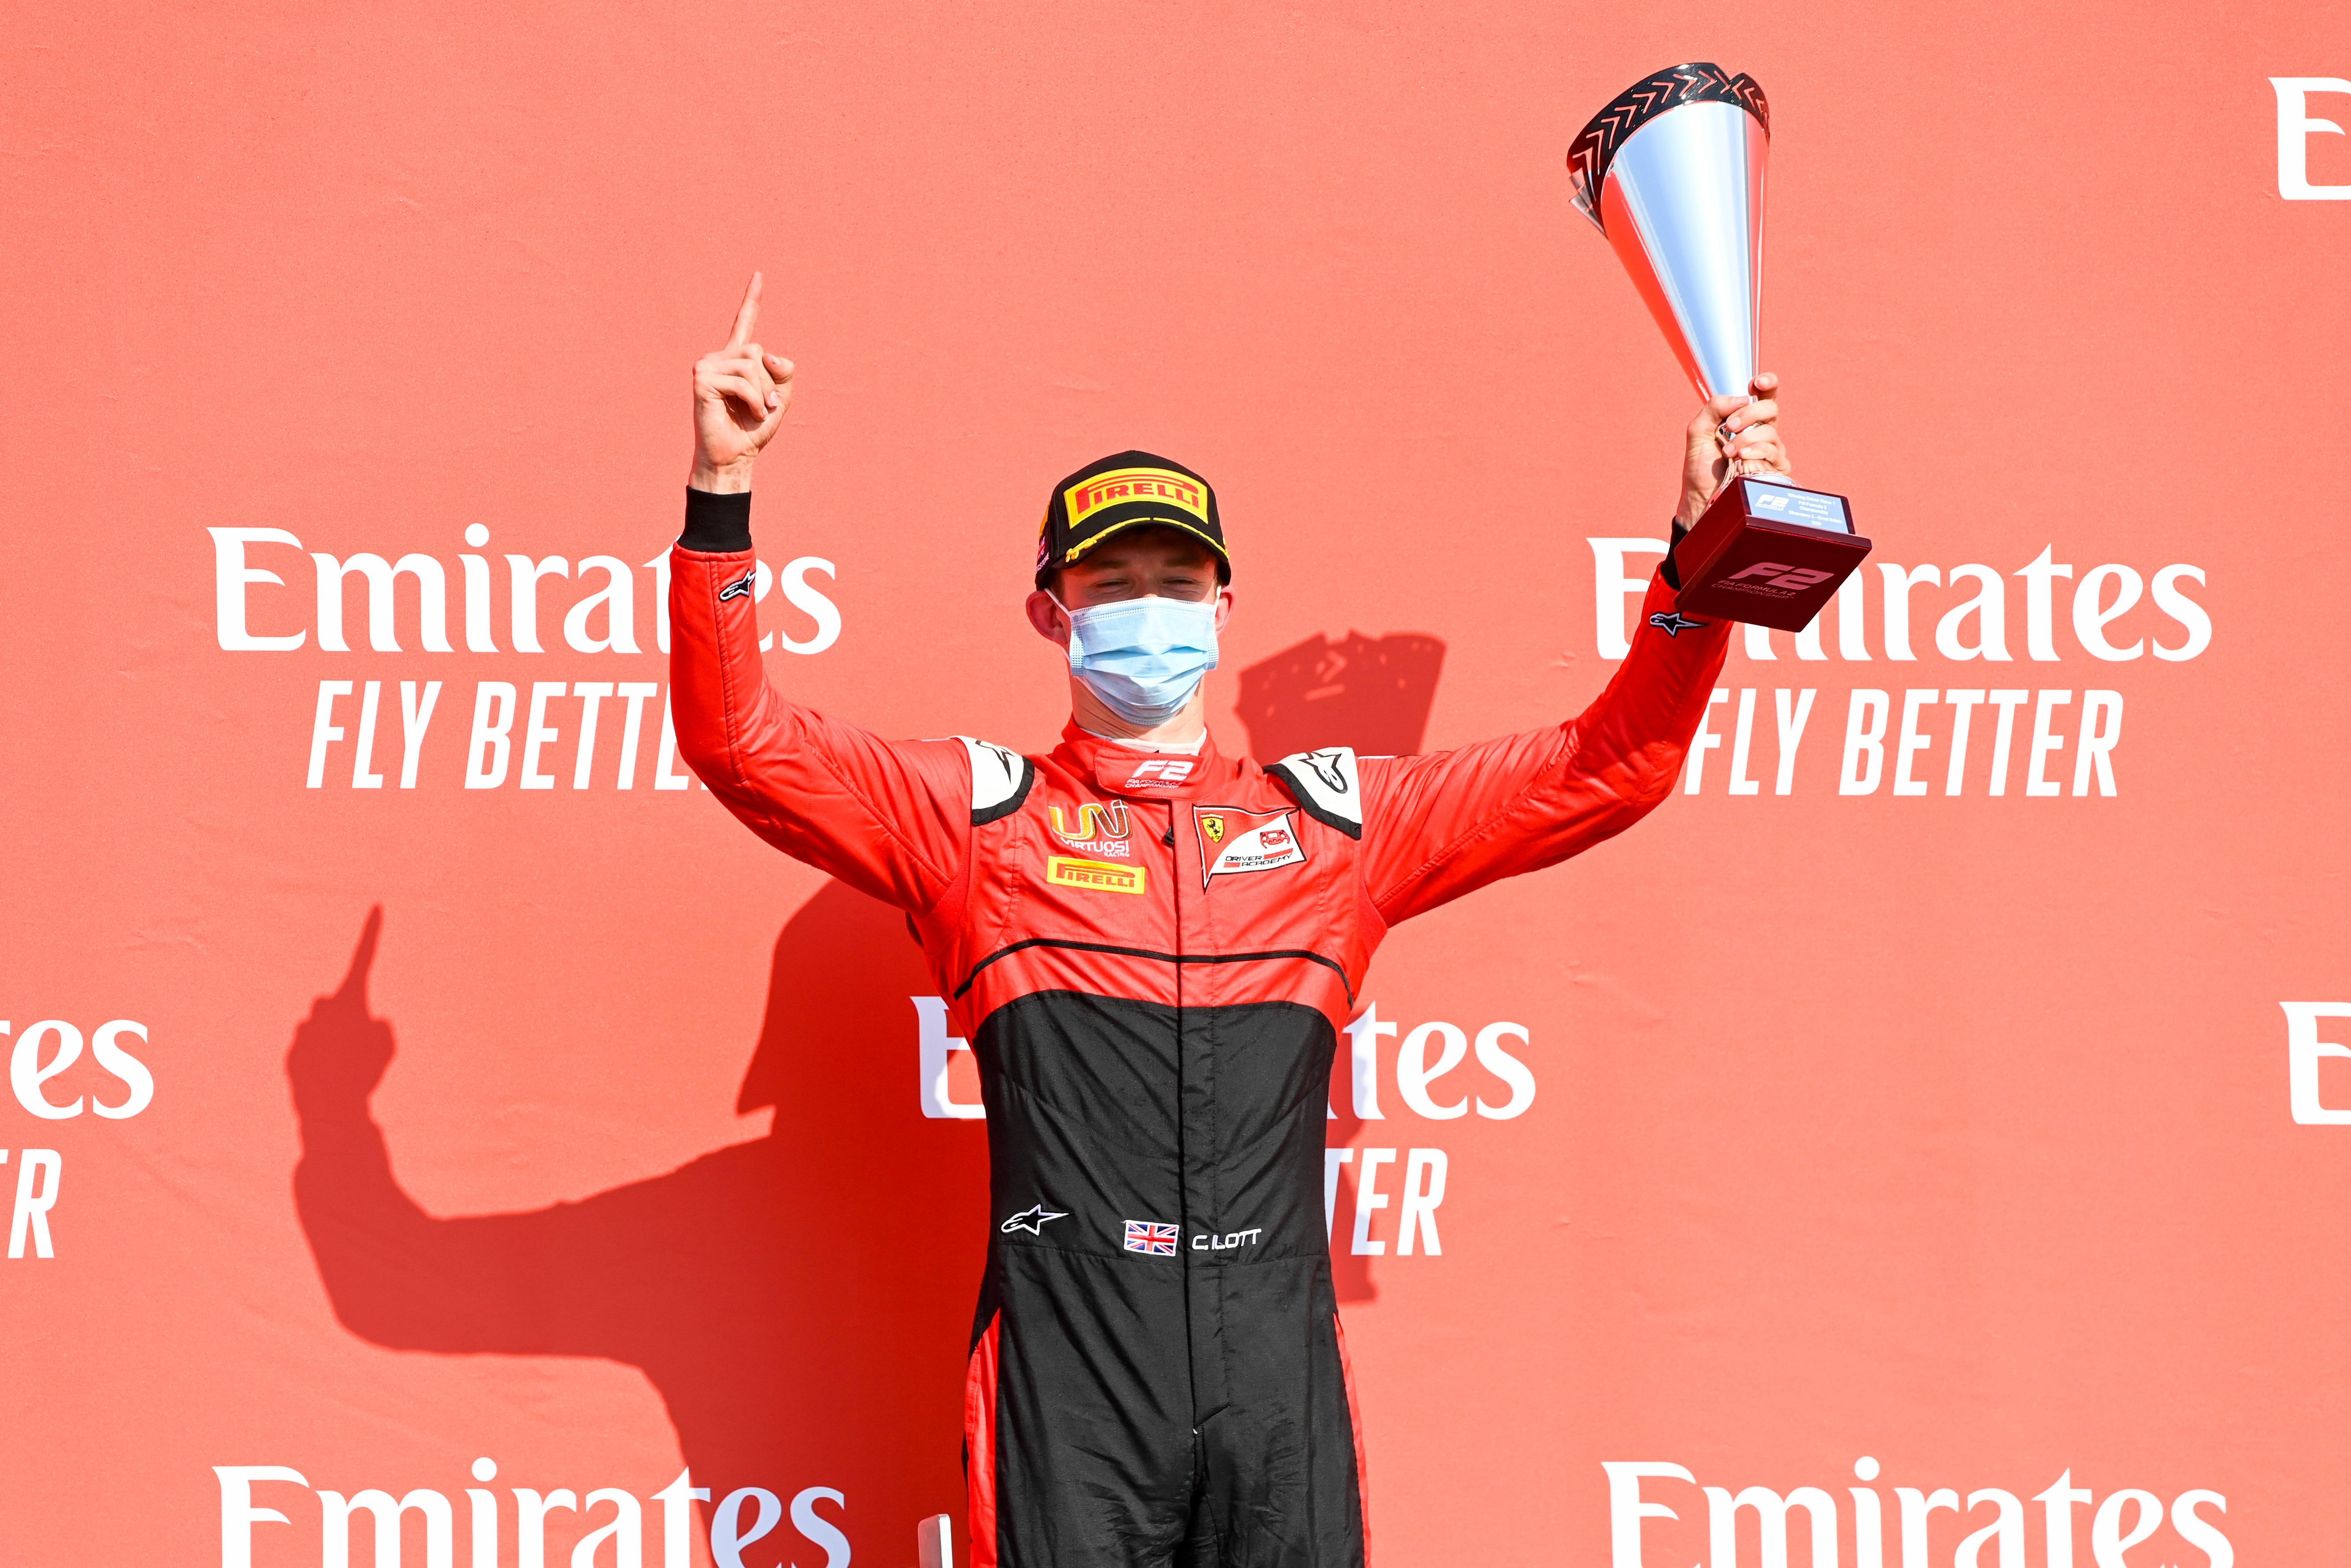 Callum Ilott celebrates winning the FIA F2 feature race at Silverstone in 2020.